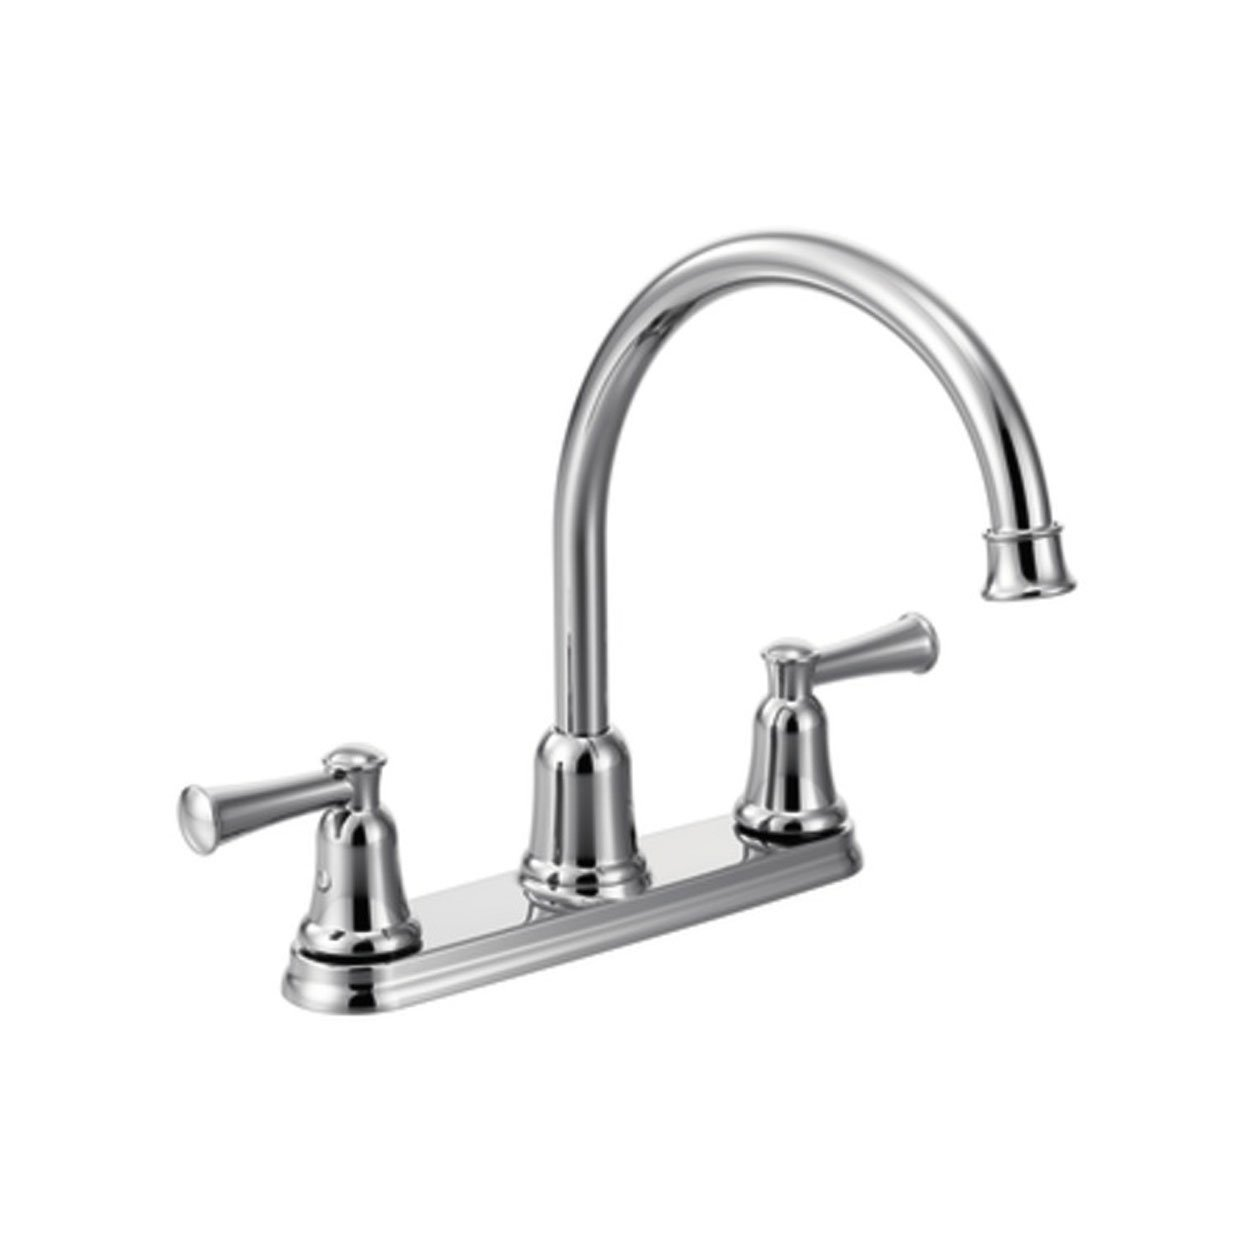 Cleveland Faucets CA41611 Capstone High-Arc Spout Two-Handle Kitchen ...